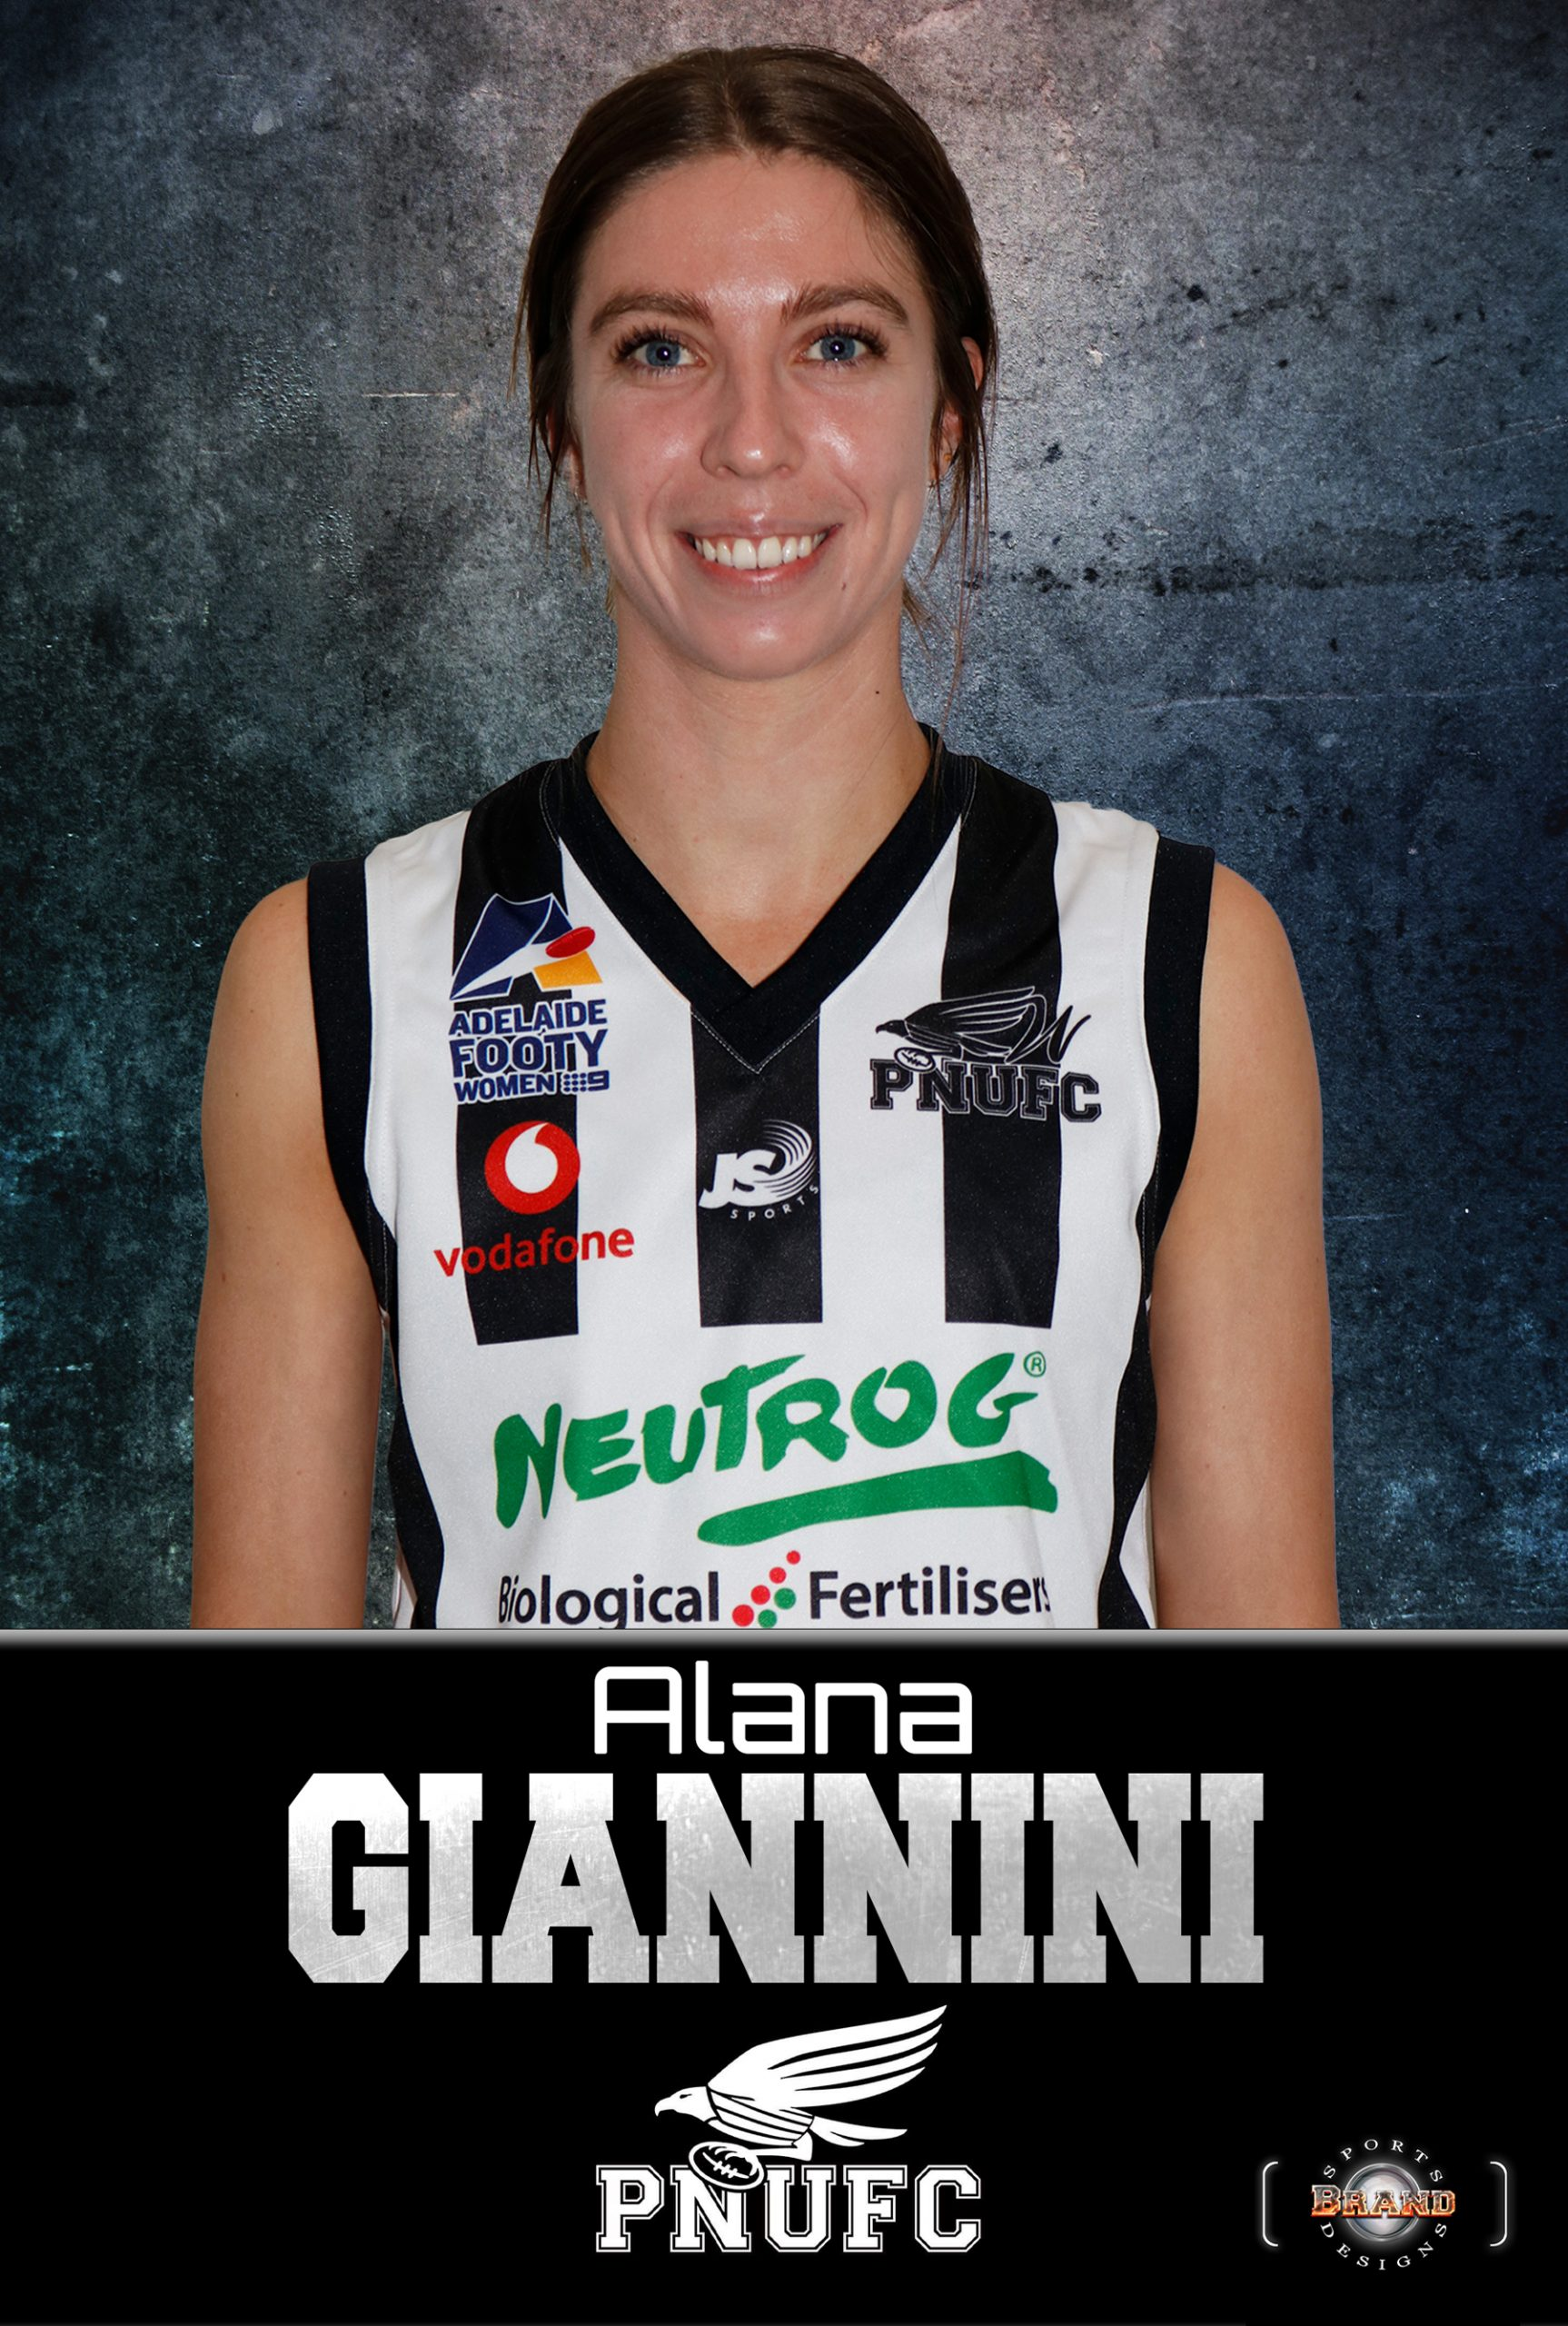 Alana Giannini